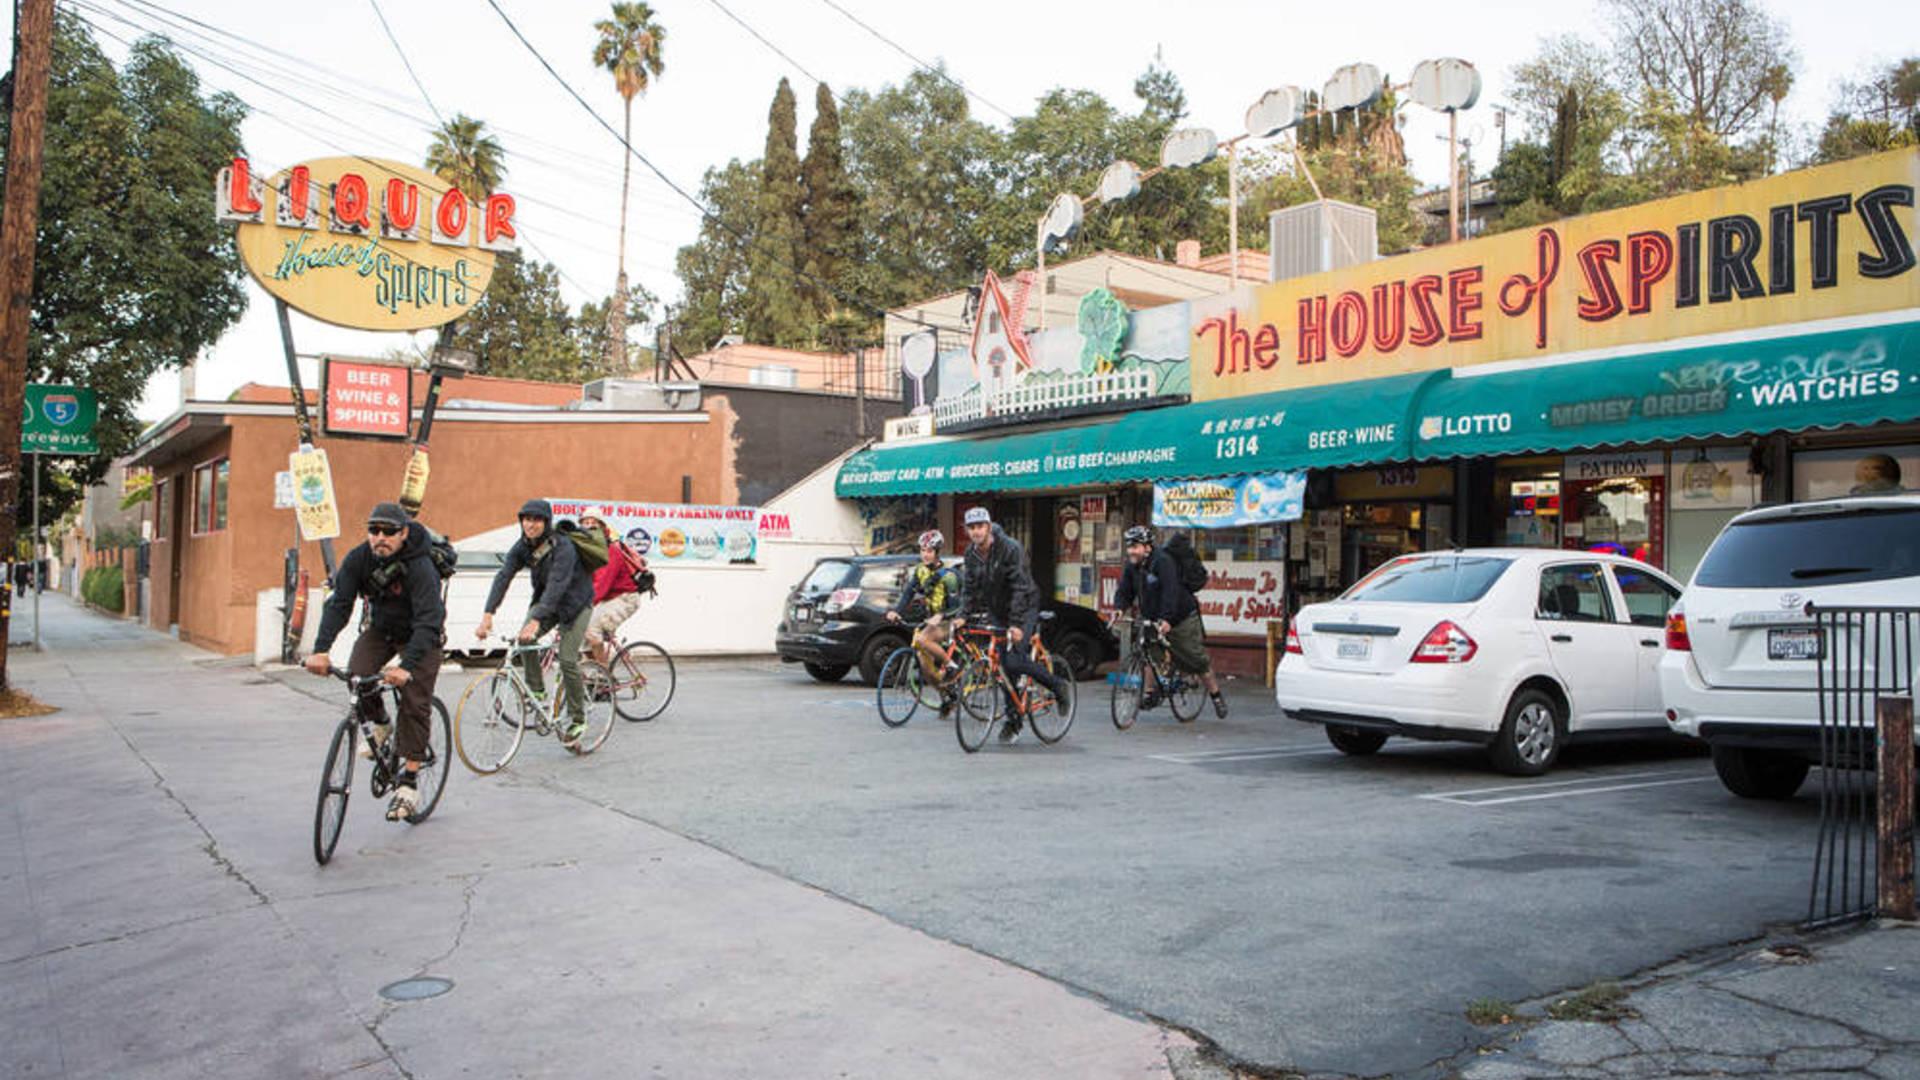 0 4200 0 2800 one la house of spirirs liquor store hipsters biking devon0329